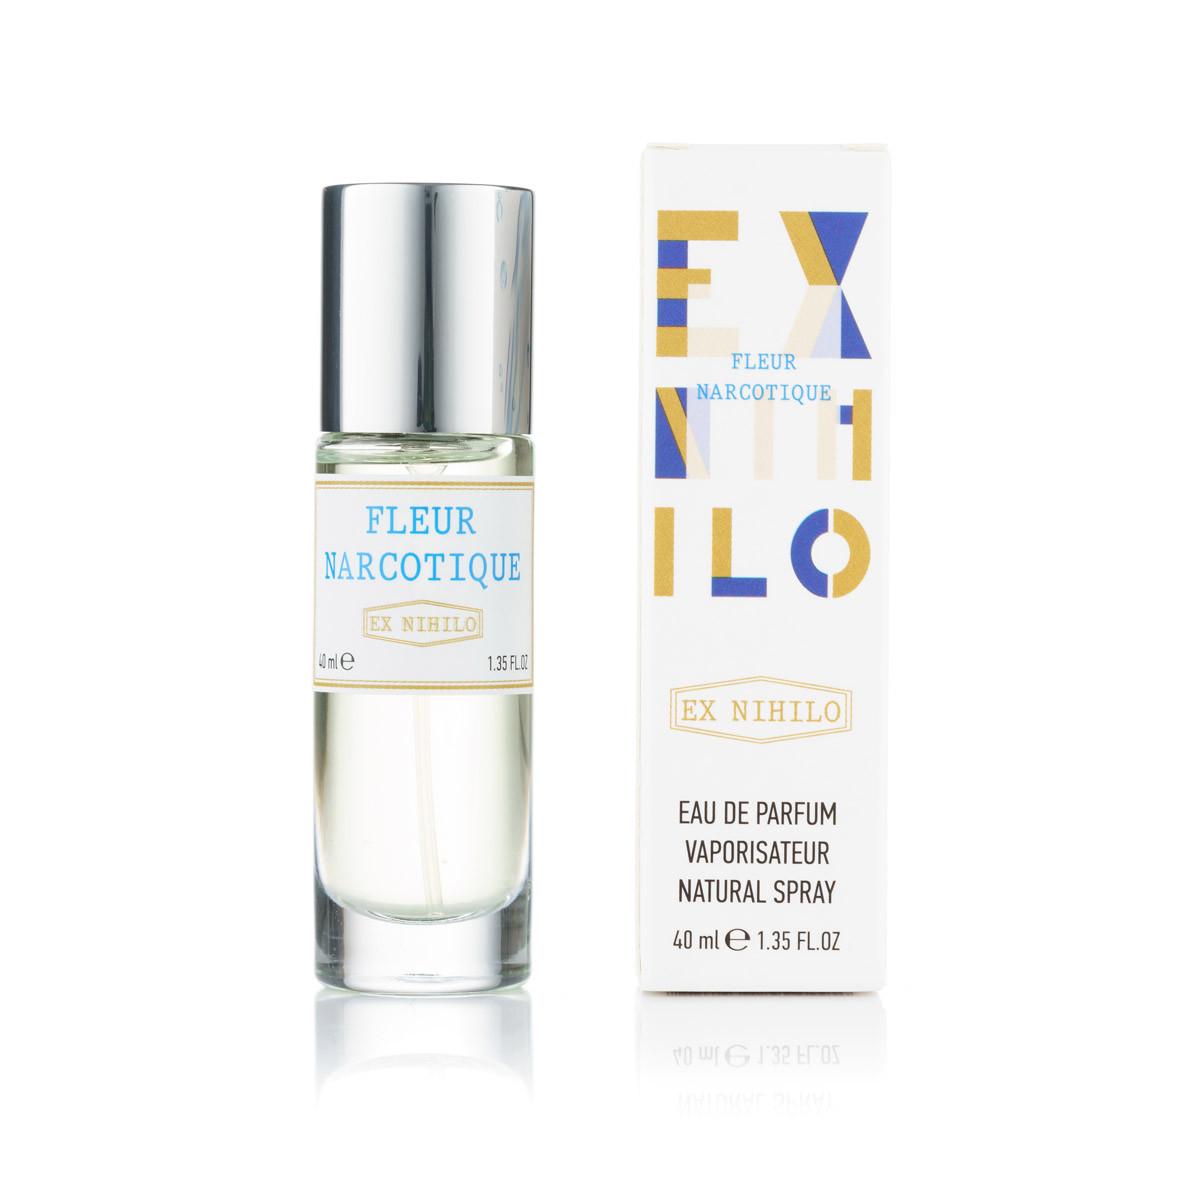 Мини парфюм Ex Nihilo Fleur Narcotique - 40 мл Унисекс (320)